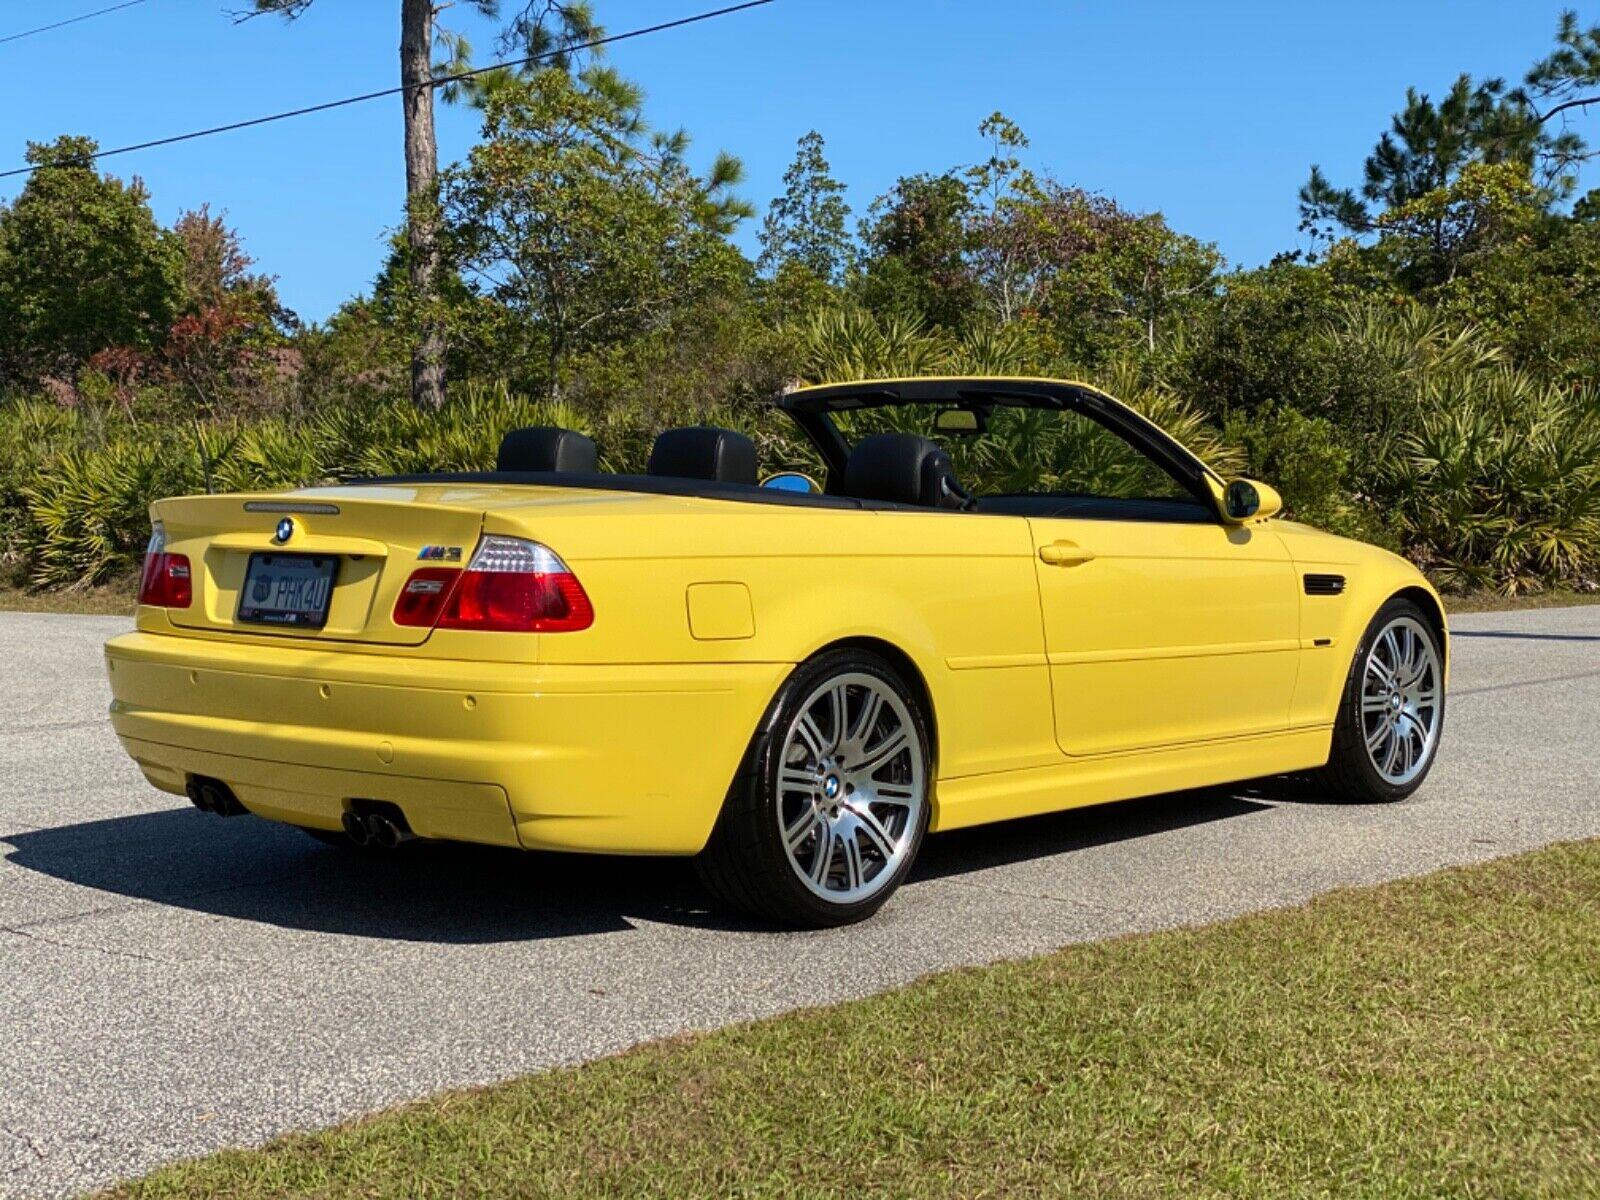 Image 1 Voiture Européenne d'occasion BMW M3 2004